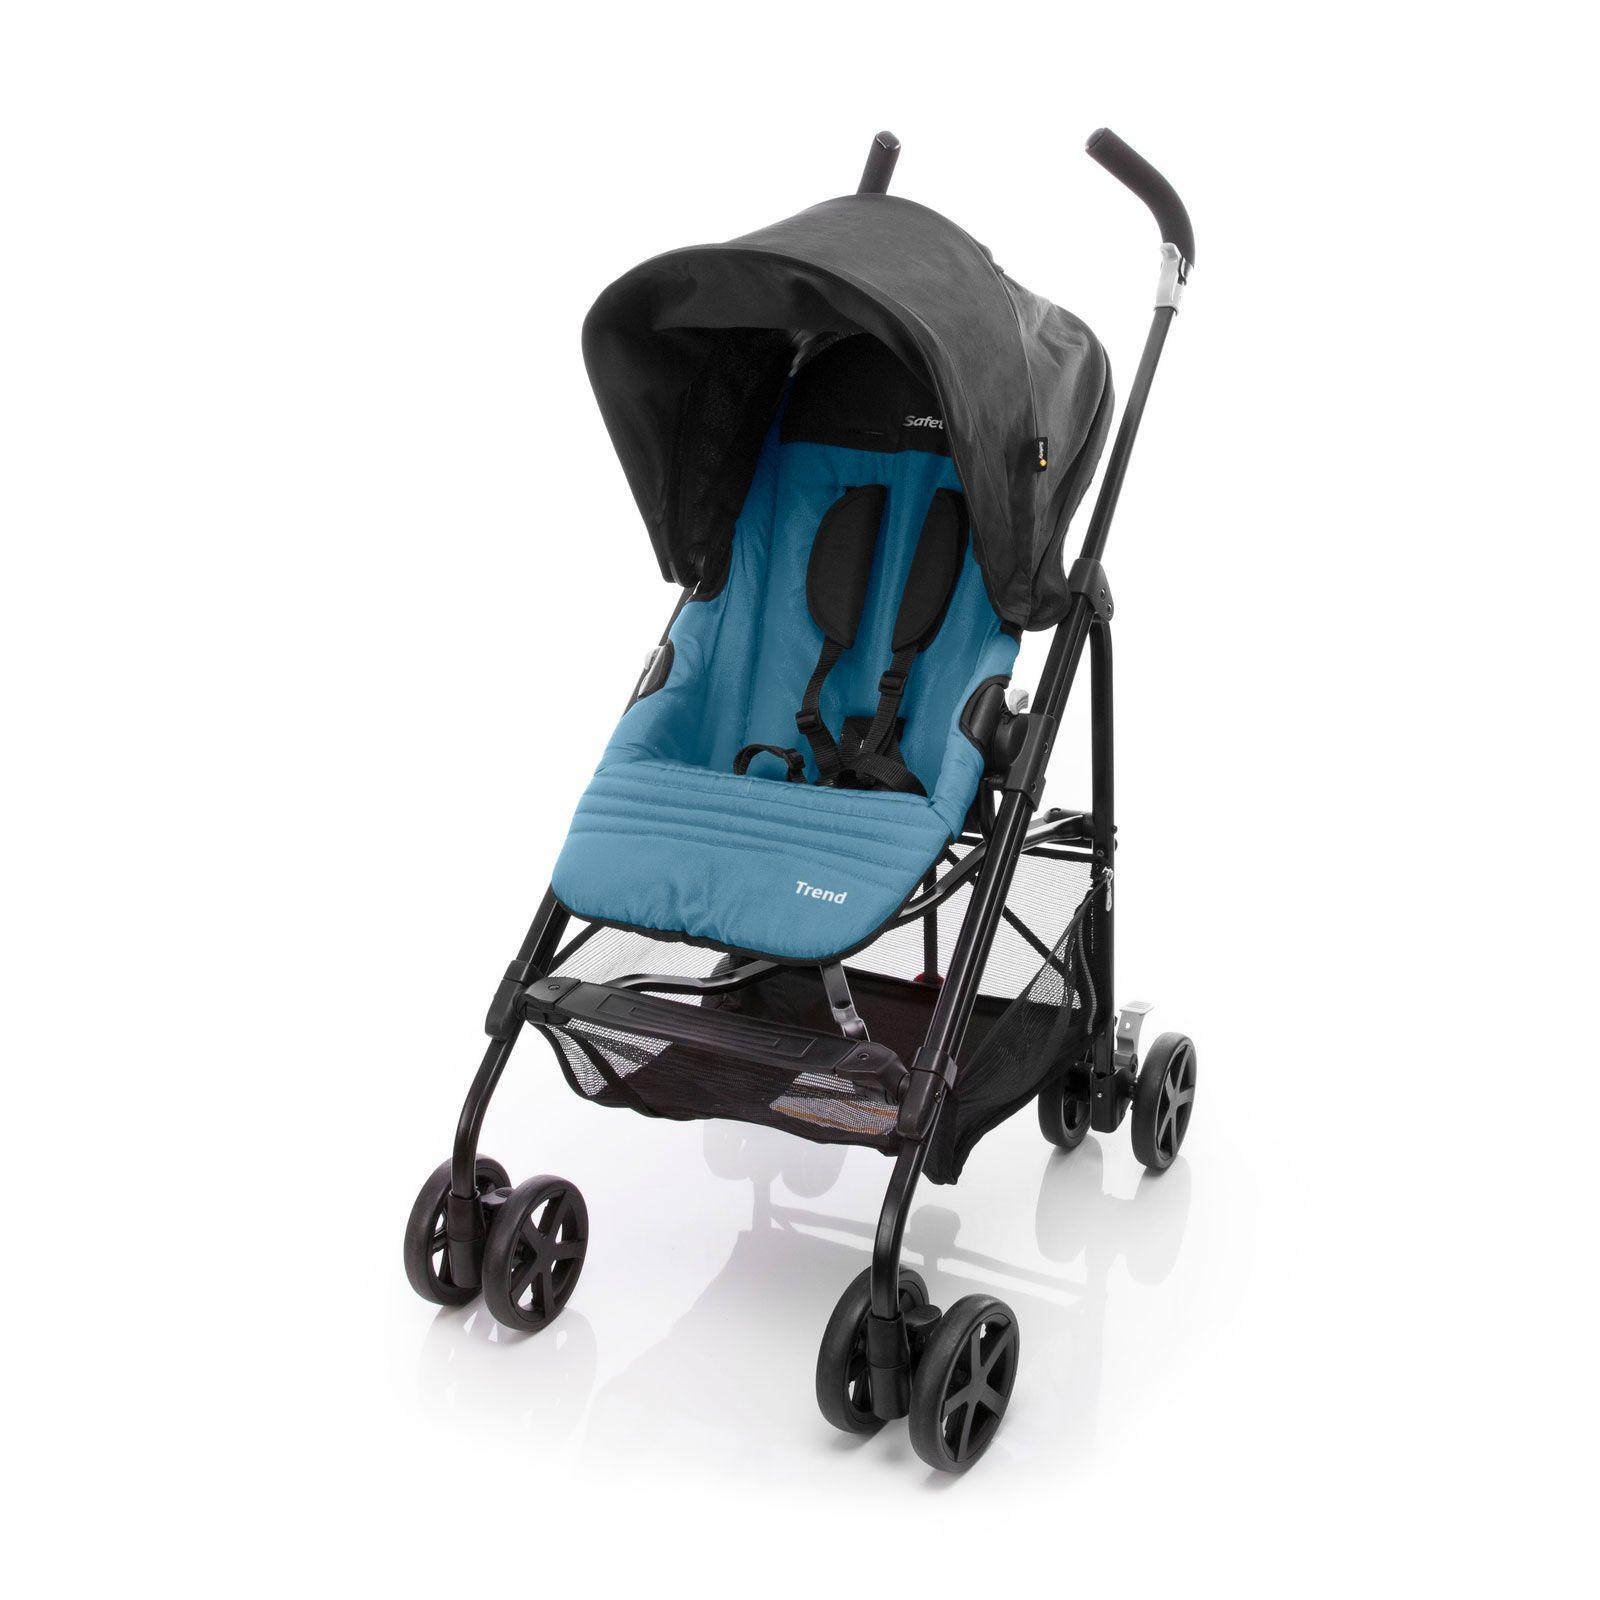 Carrinho Travel System Trend Blue - Safety 1st Refd968bts-trio